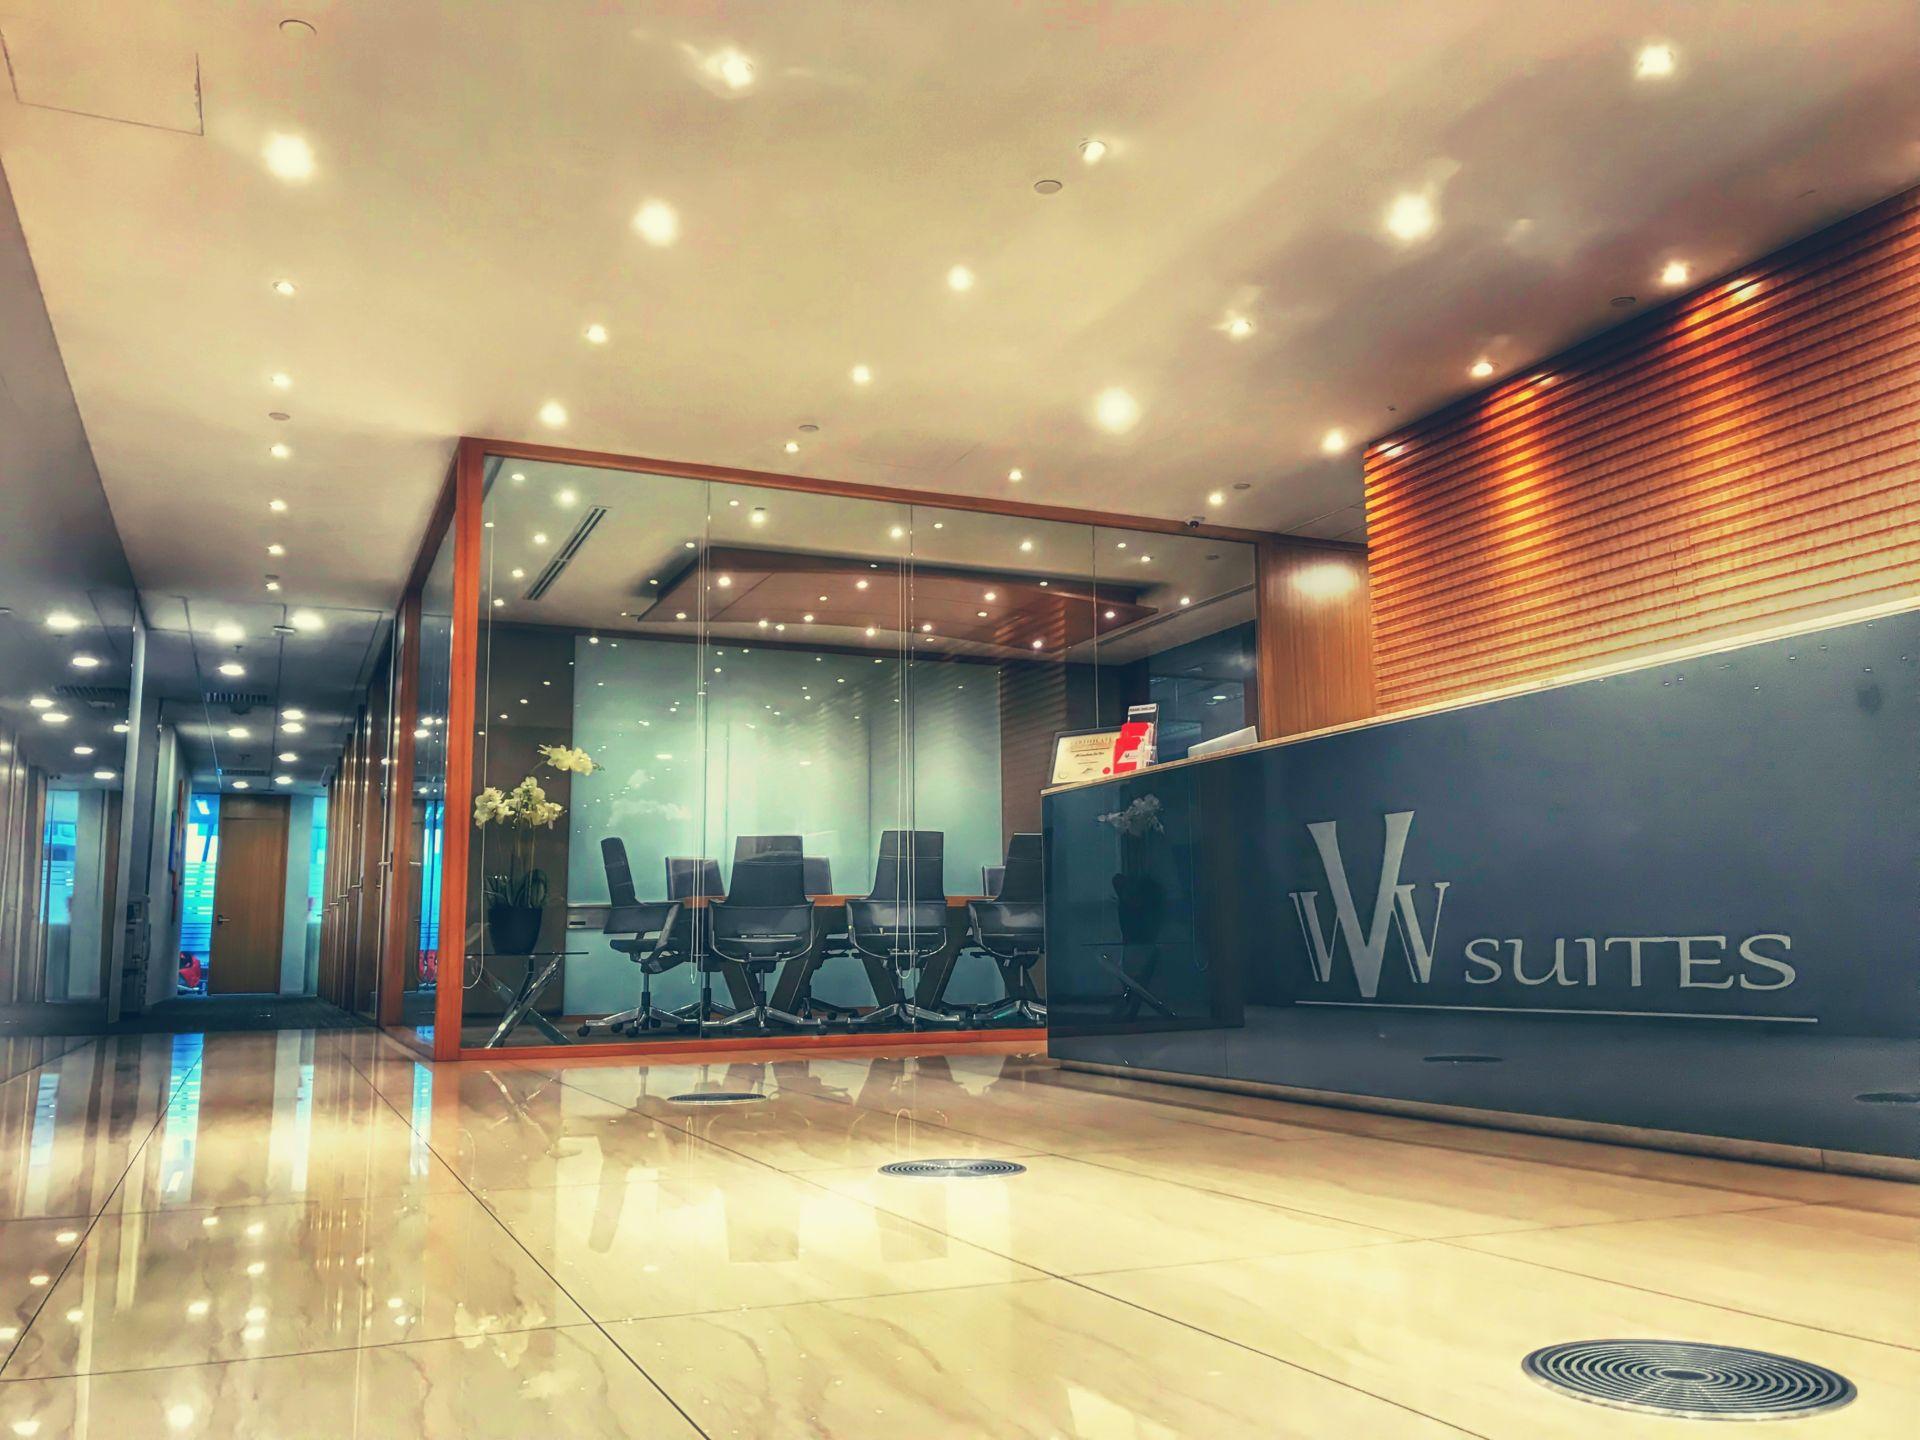 VVV Suites, Kuala Lumpur